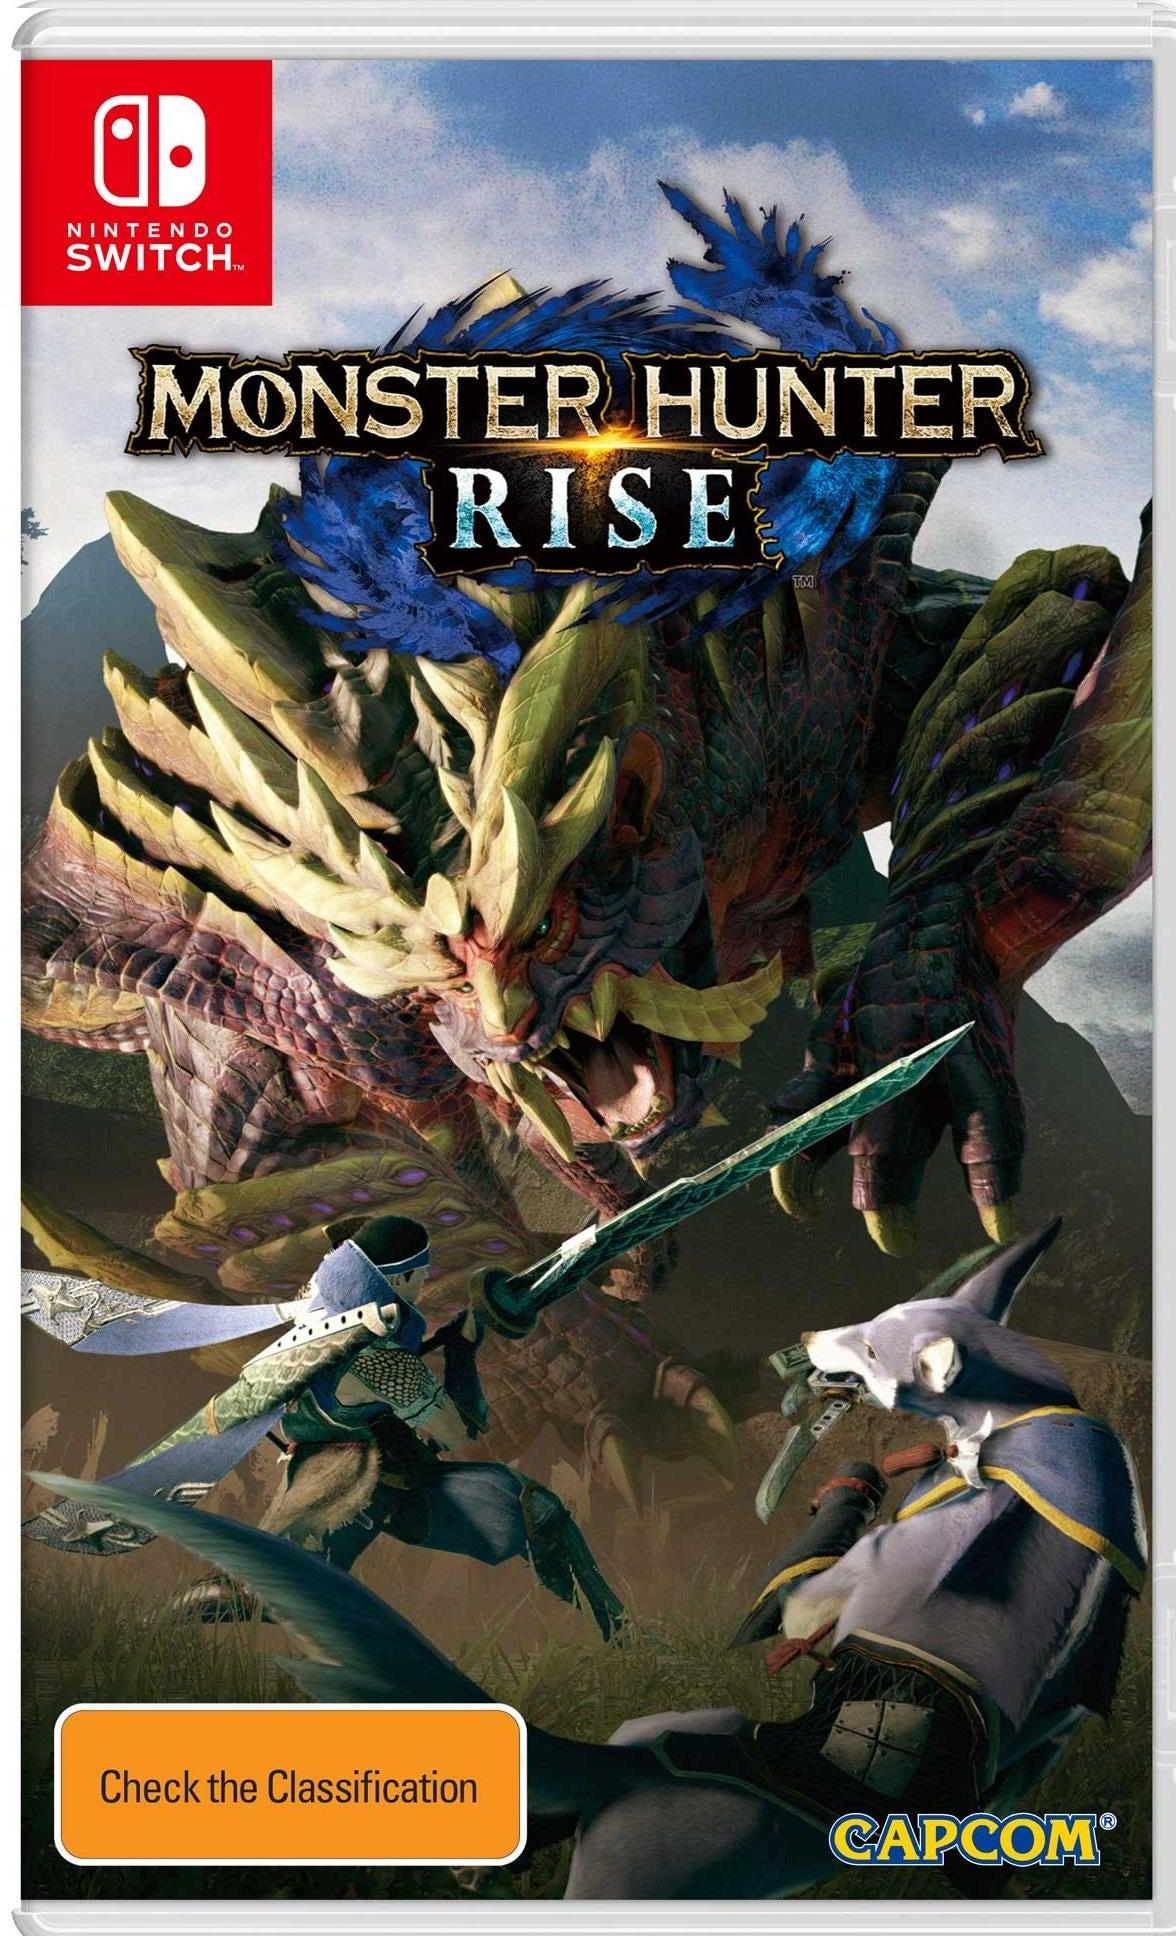 Capcom Monster Hunter Rise Nintendo Switch Game